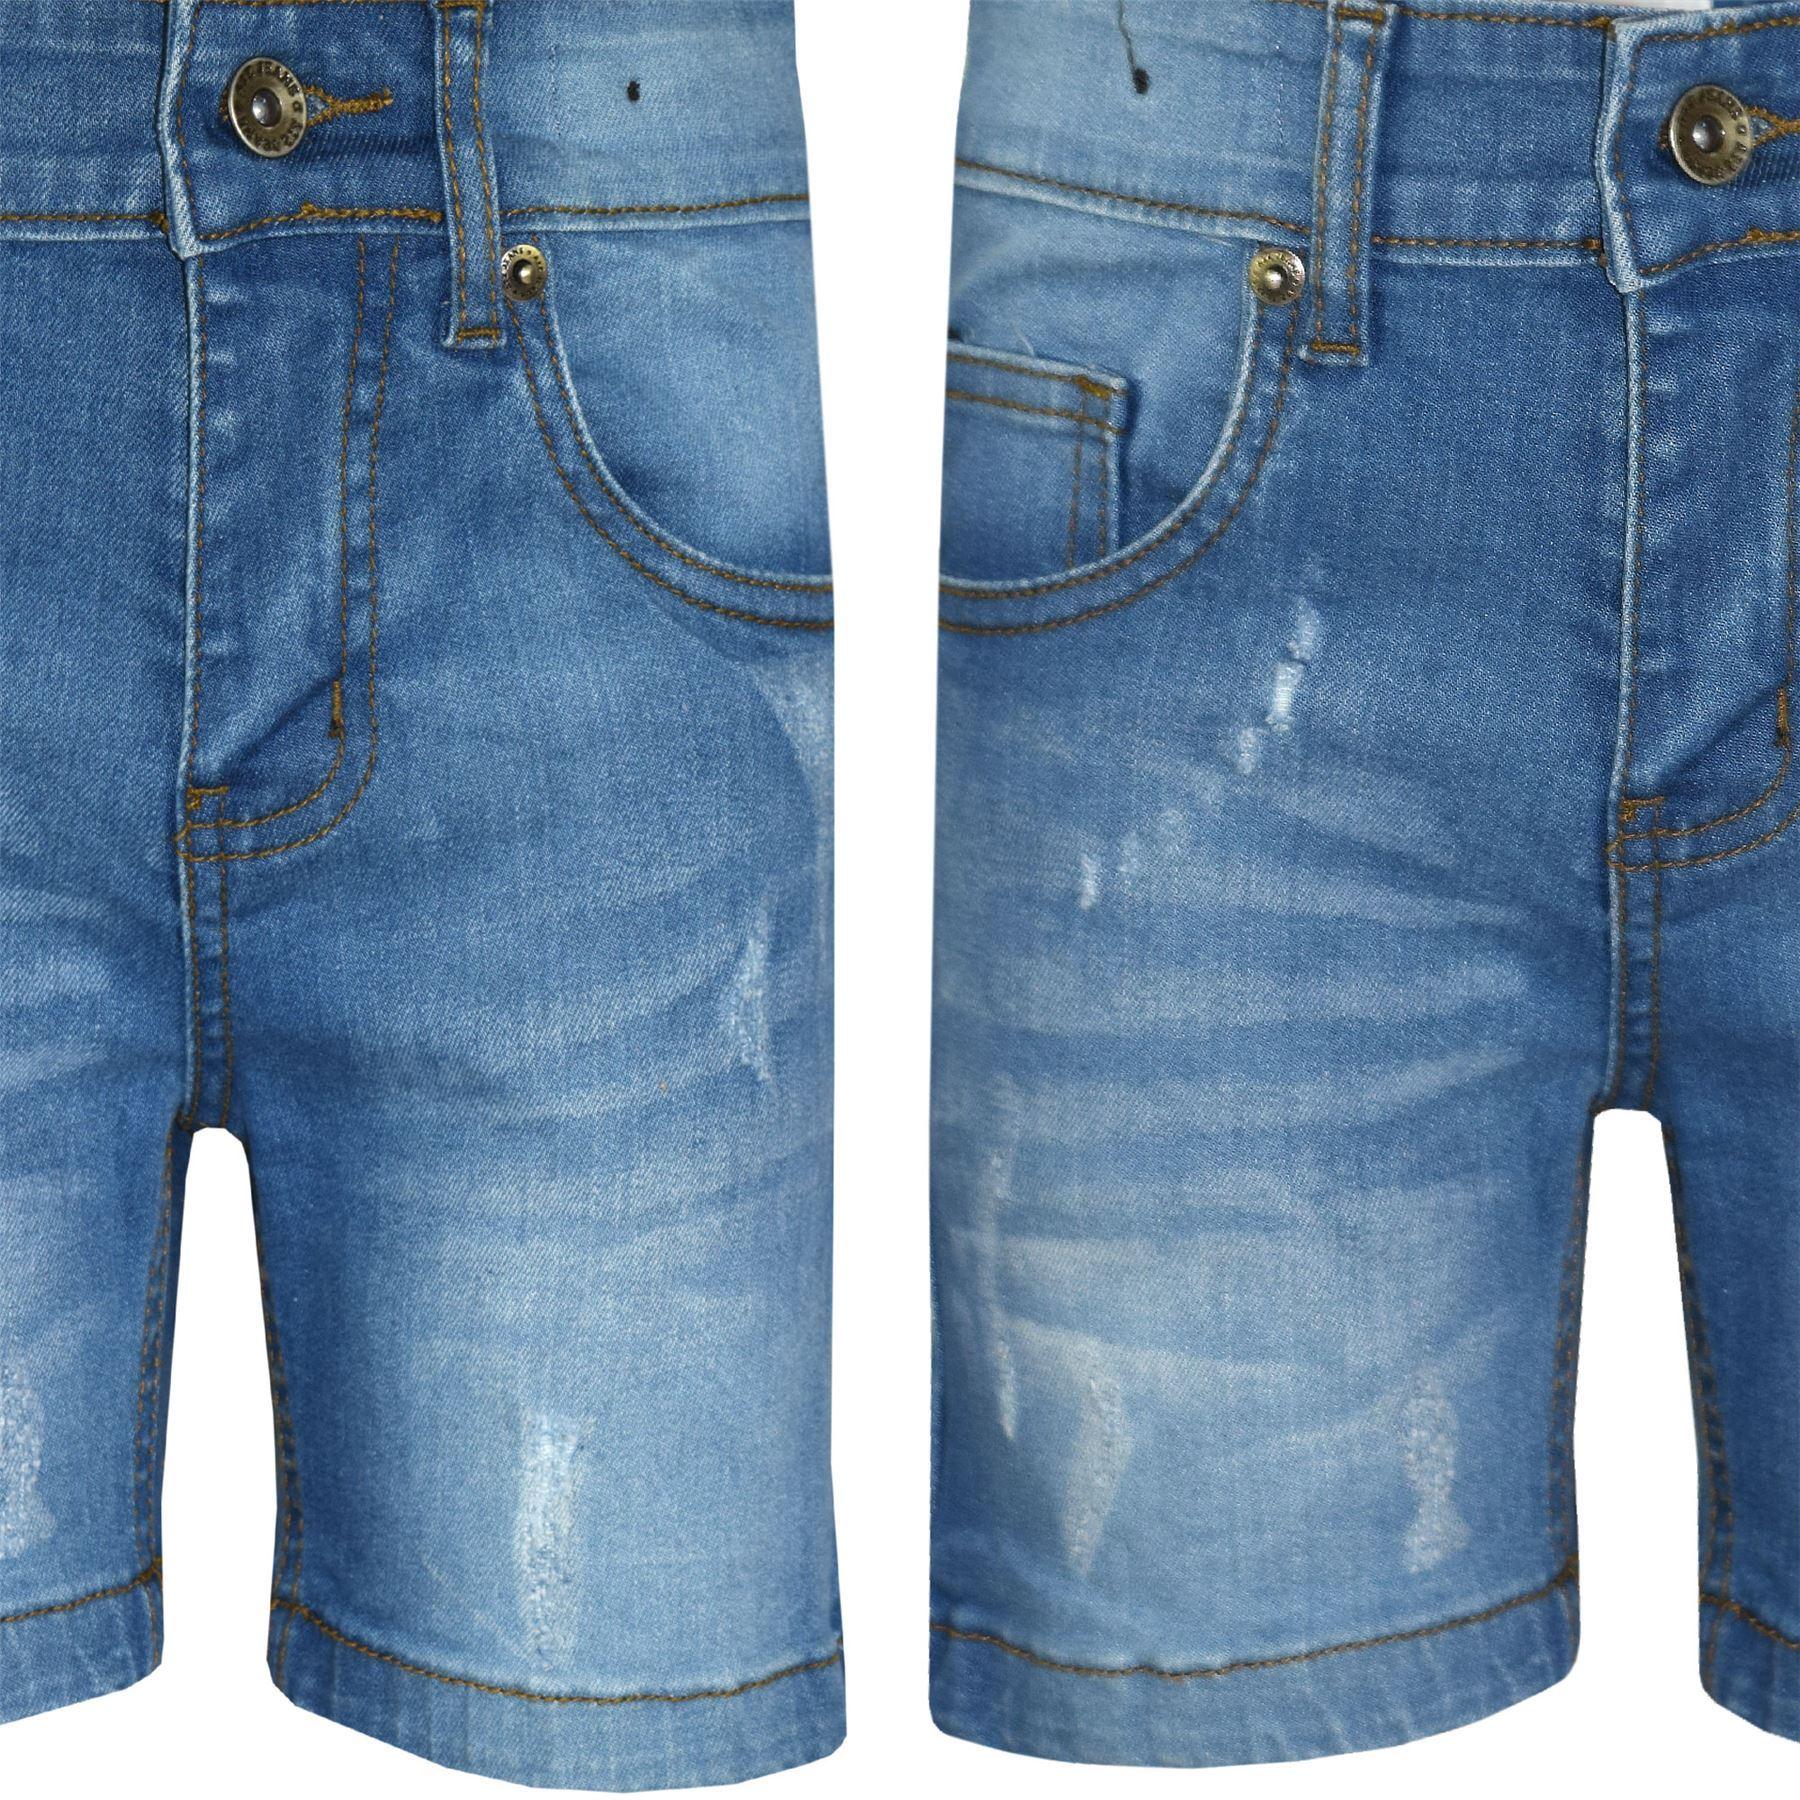 529c7da6e812 Kids Boys Denim Shorts Light Blue Ripped Chino Bermuda Jeans Short Knee  Length Shorts Boys